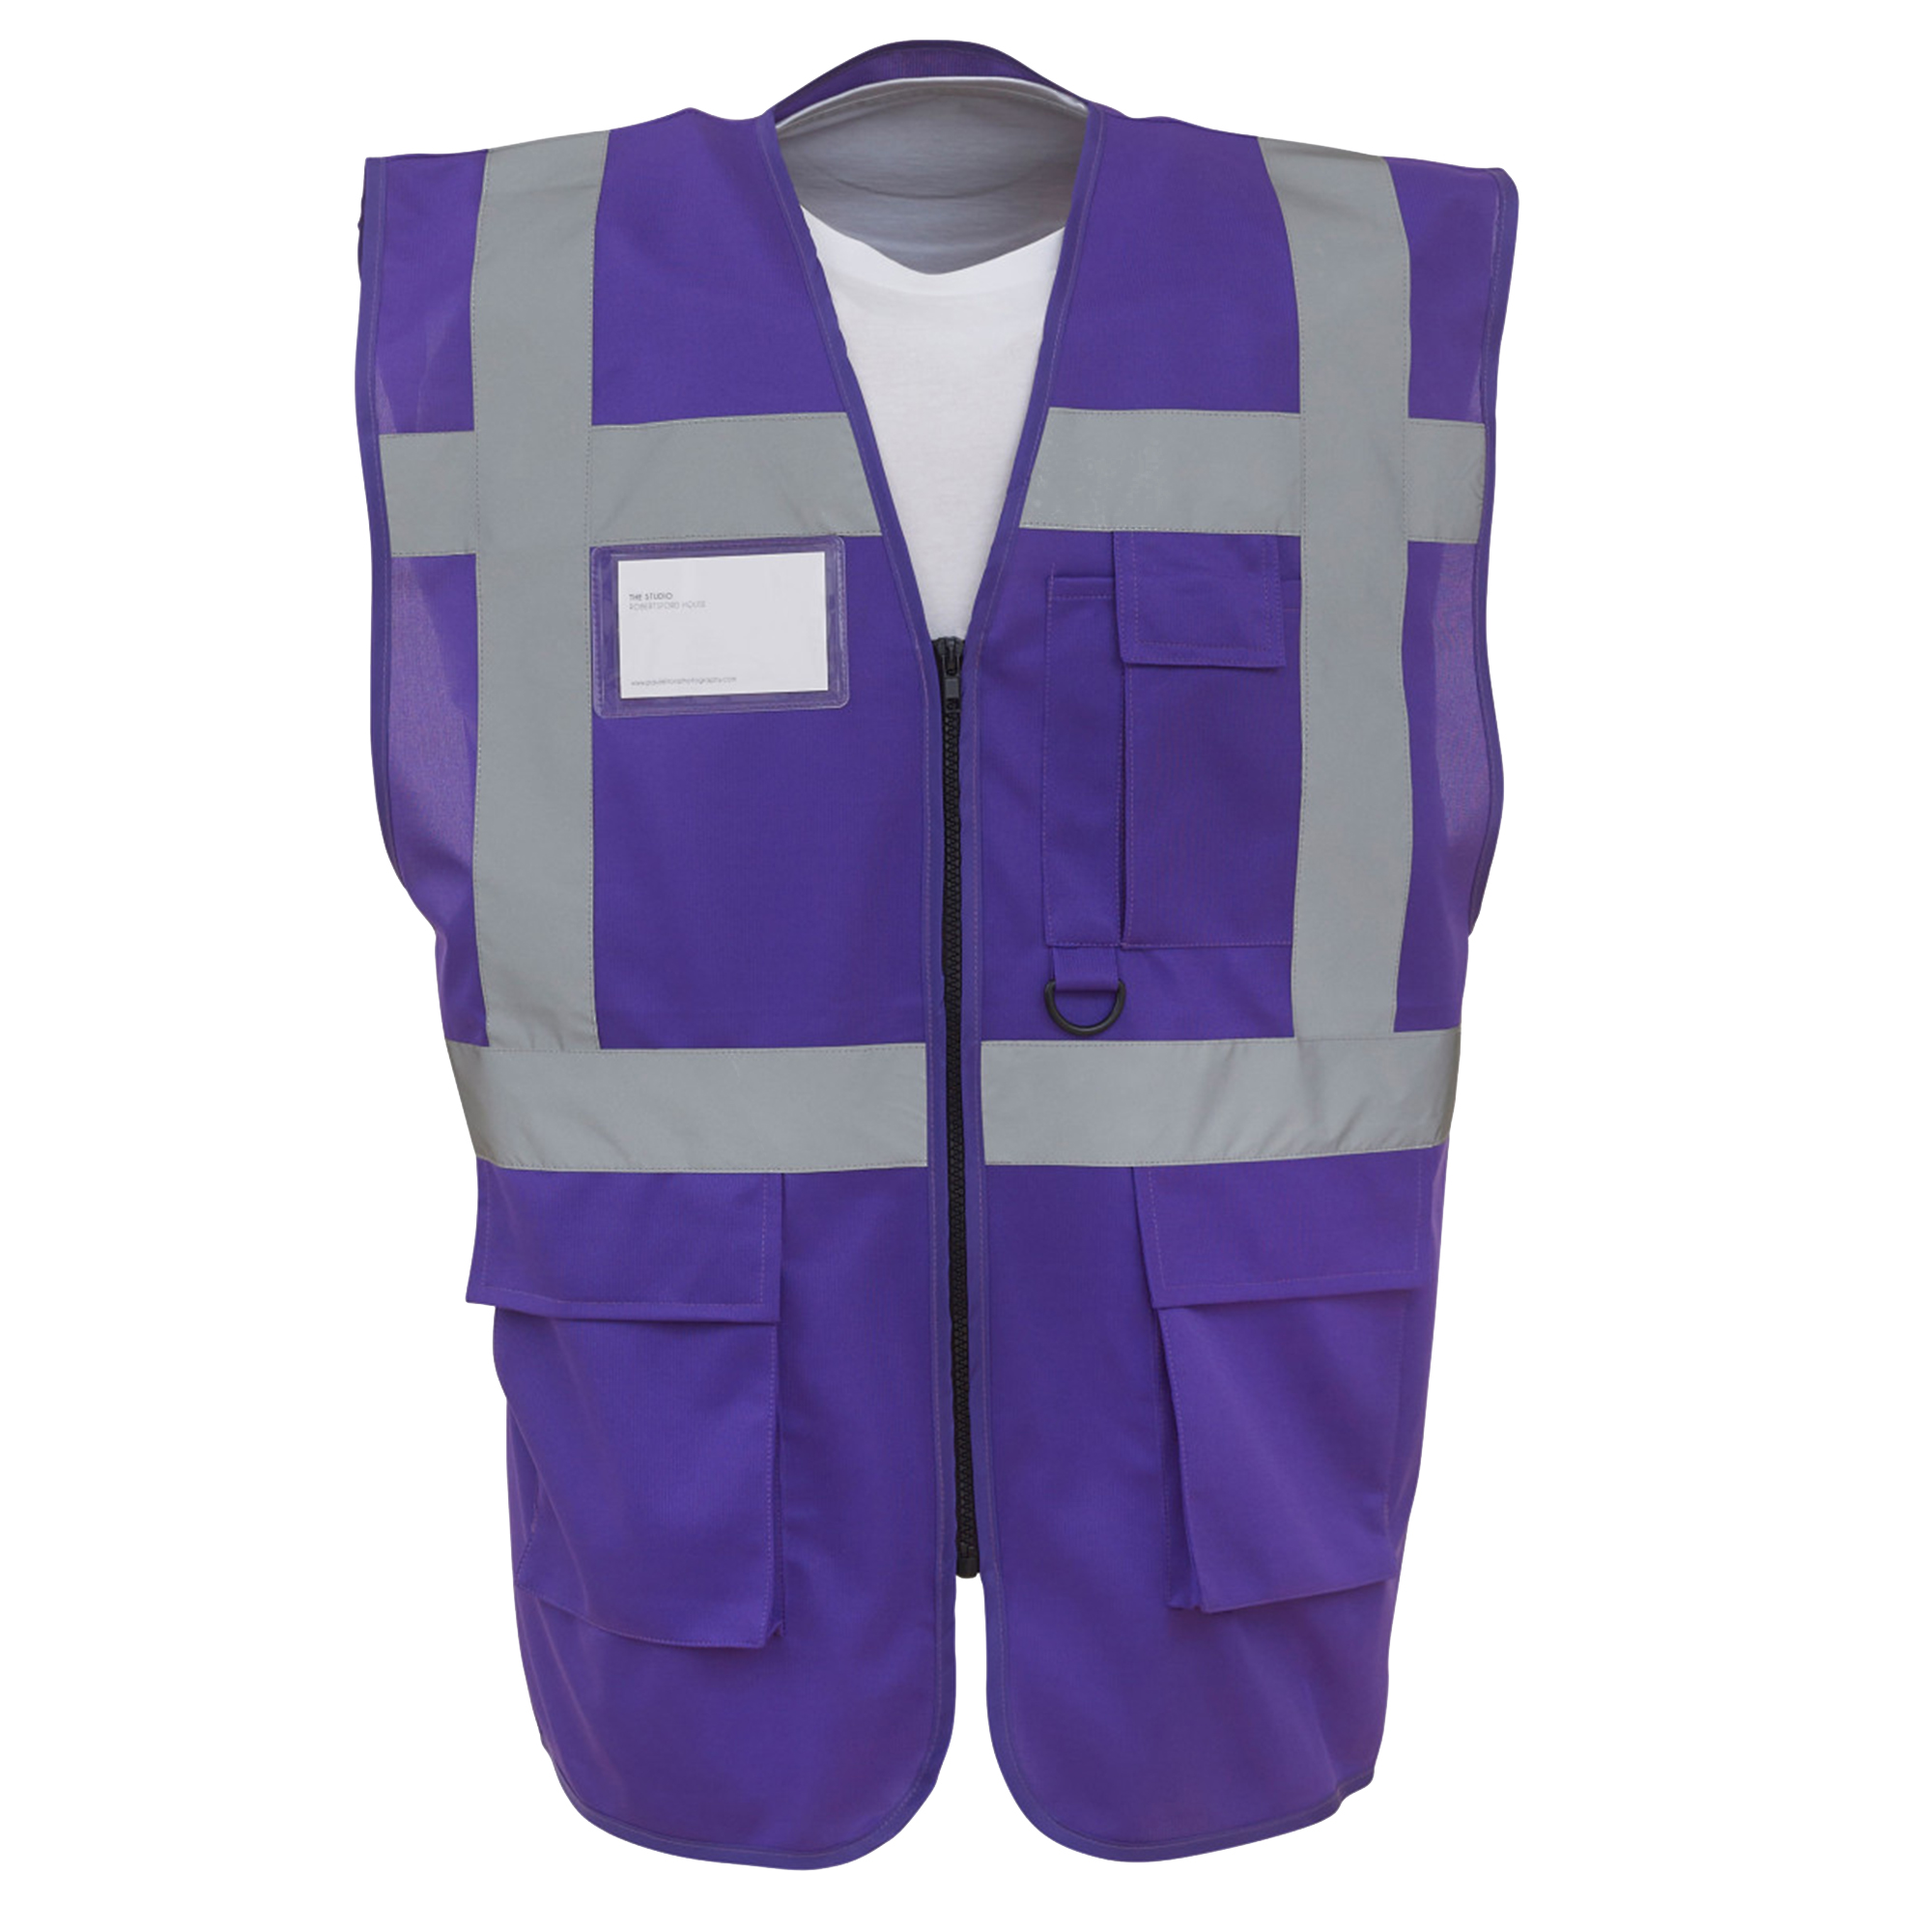 Yoko Hi-Vis Premium Executive/Manager Waistcoat / Jacket (Pack of 2) (2XL) (Purple)